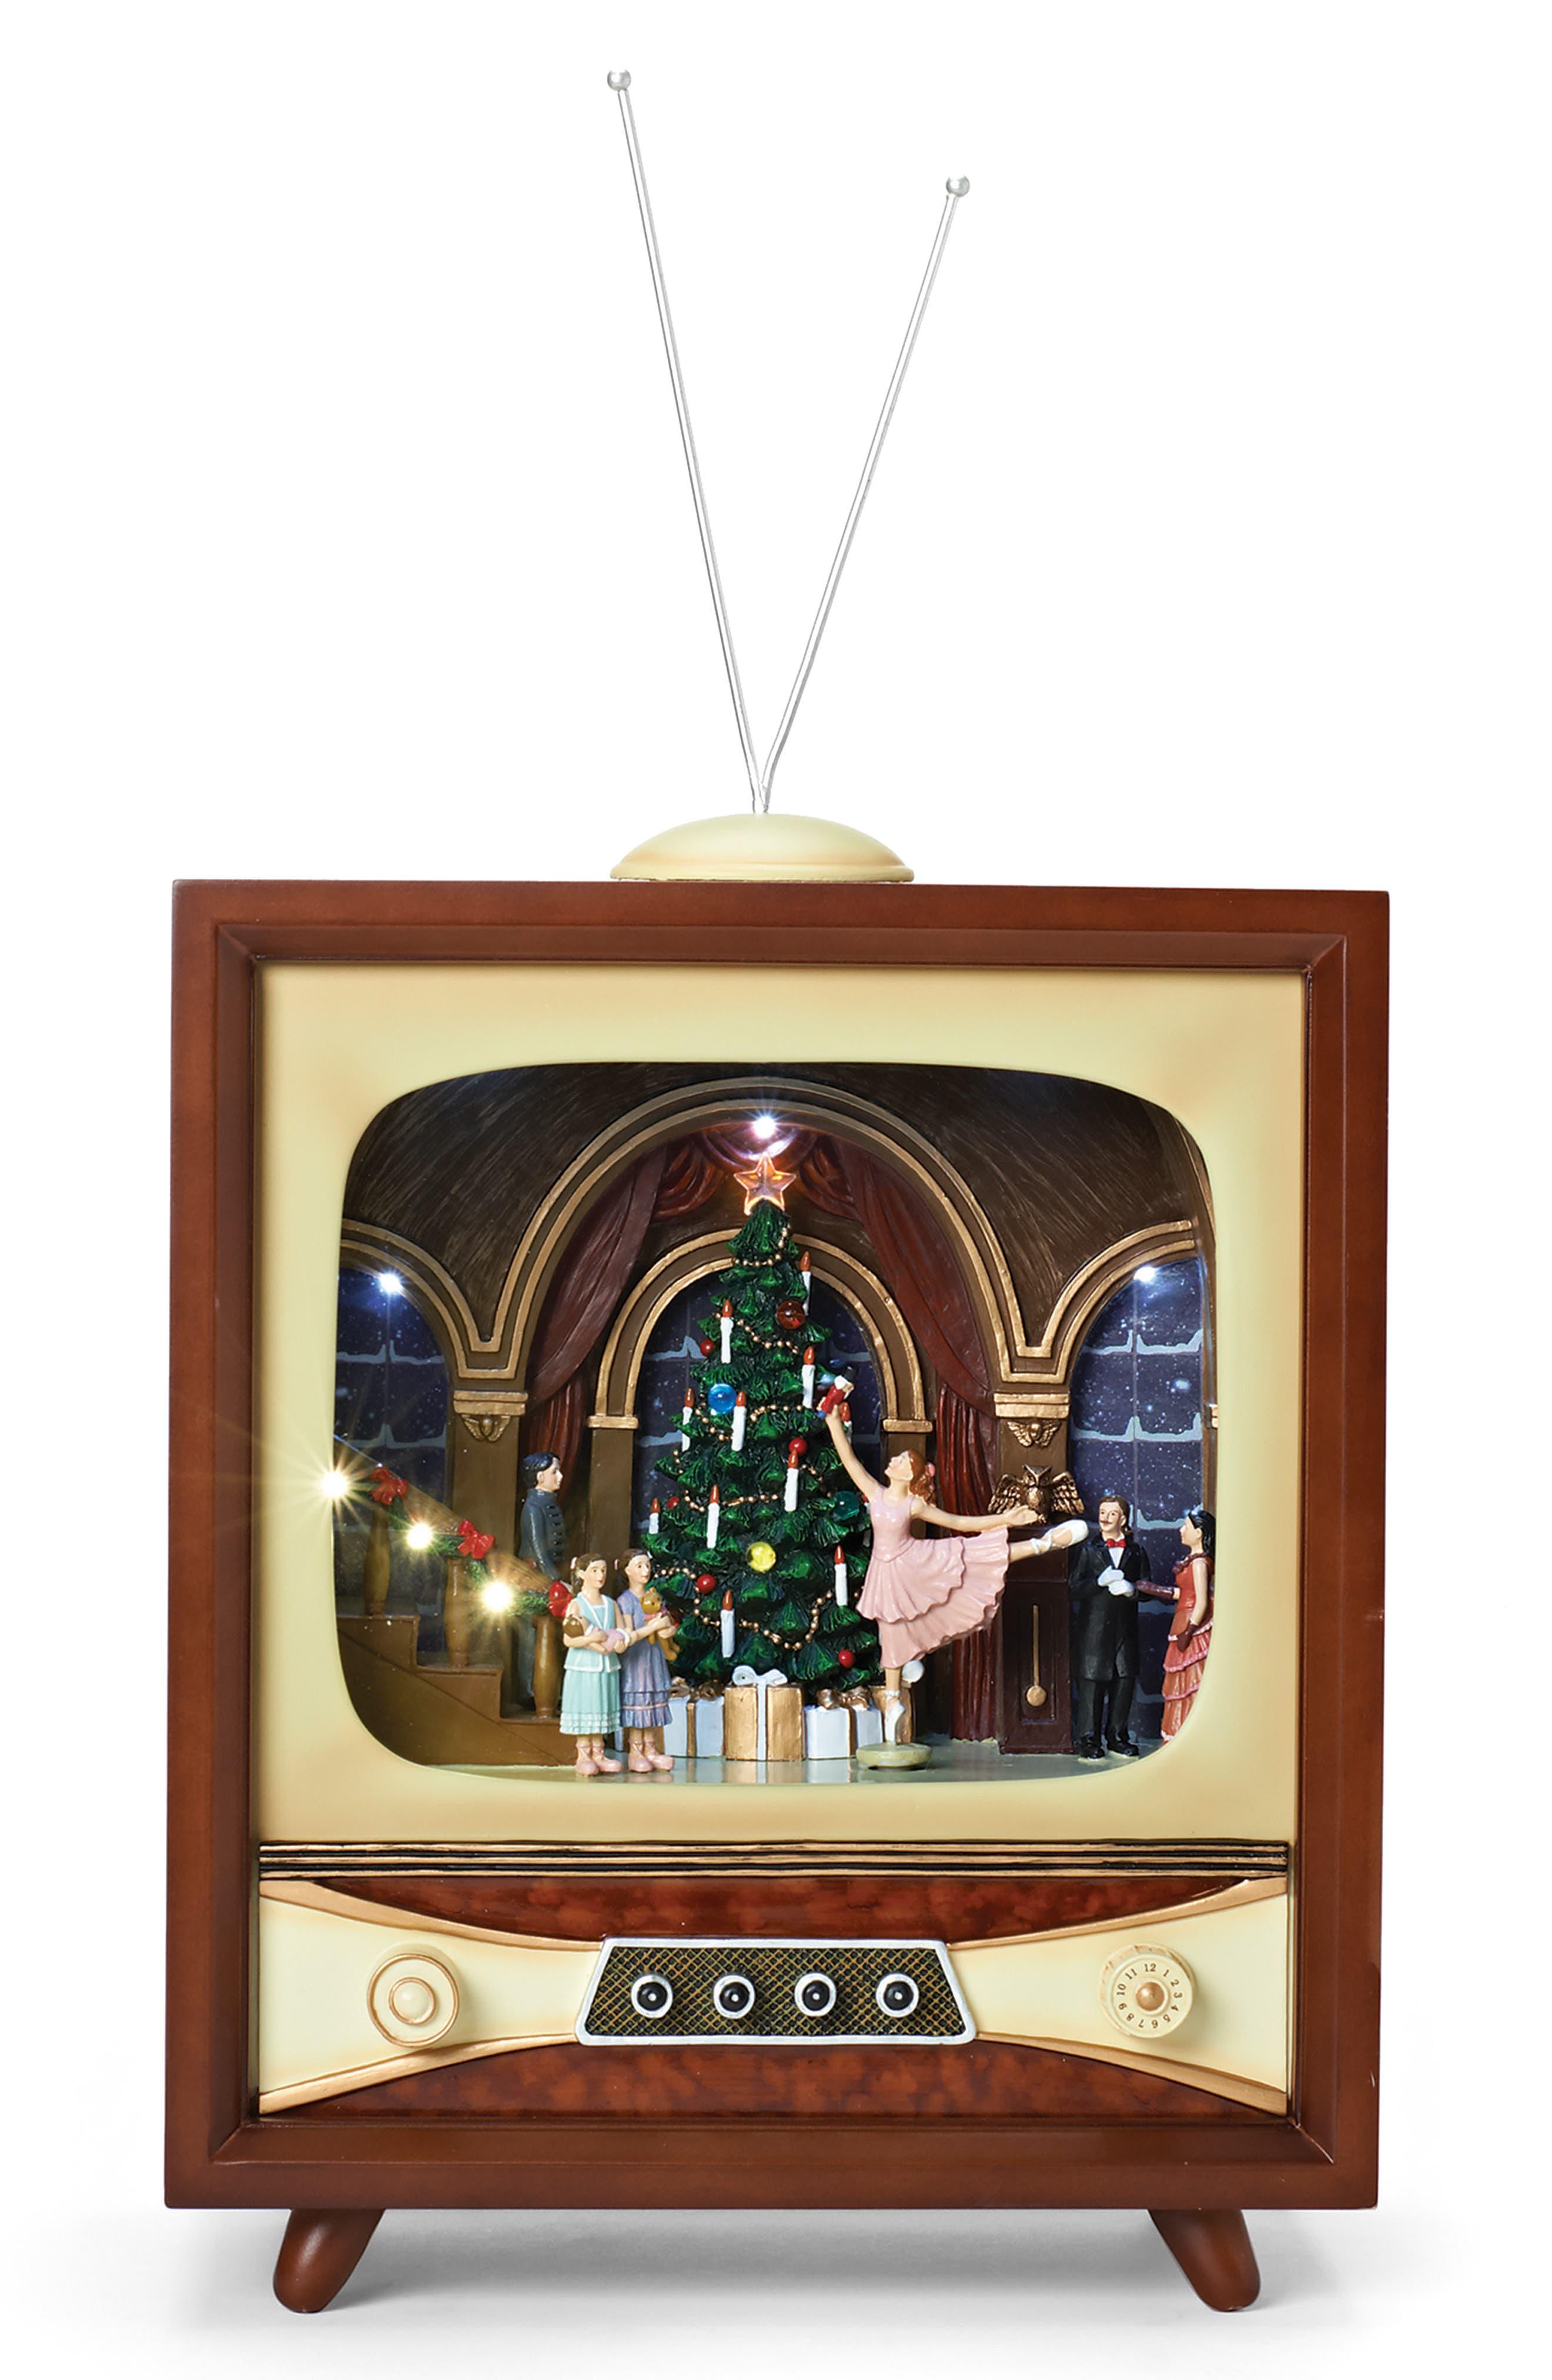 Main Image - Roman Nutcracker Diorama Music Box